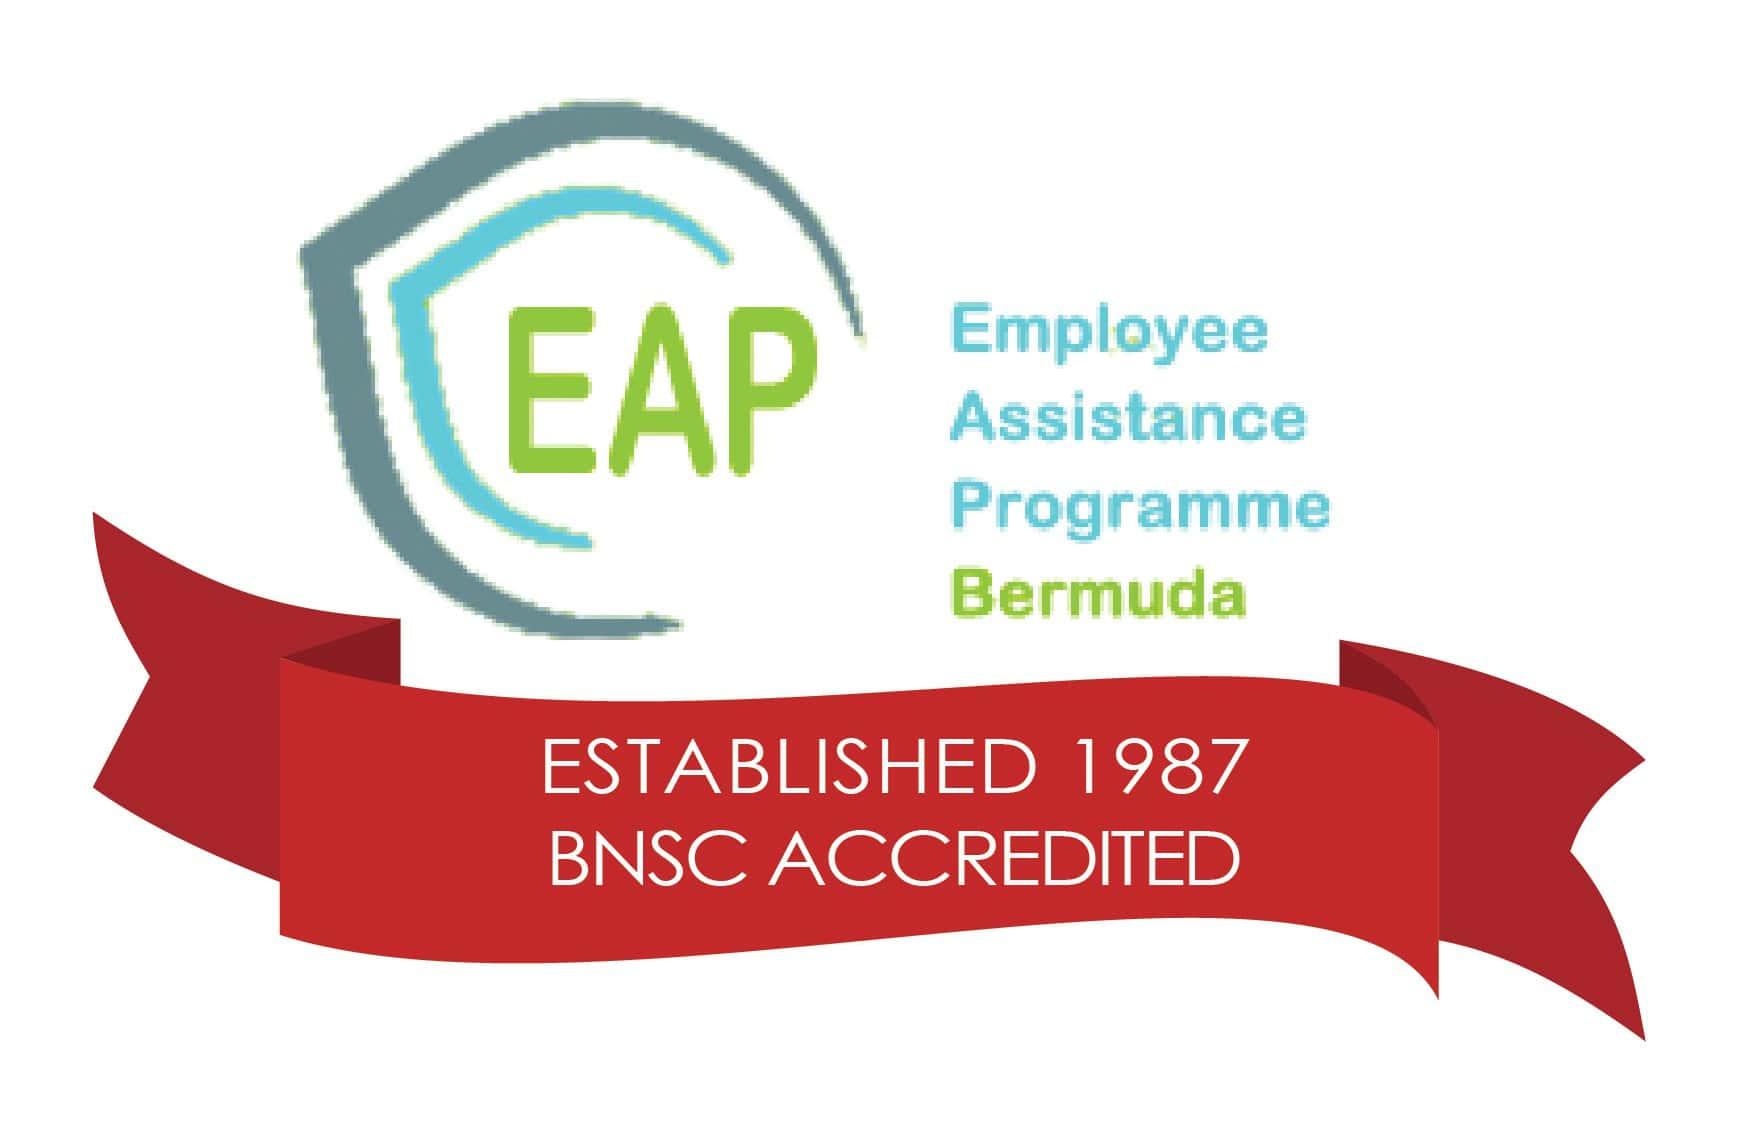 Employee Assistance Programme Bermuda